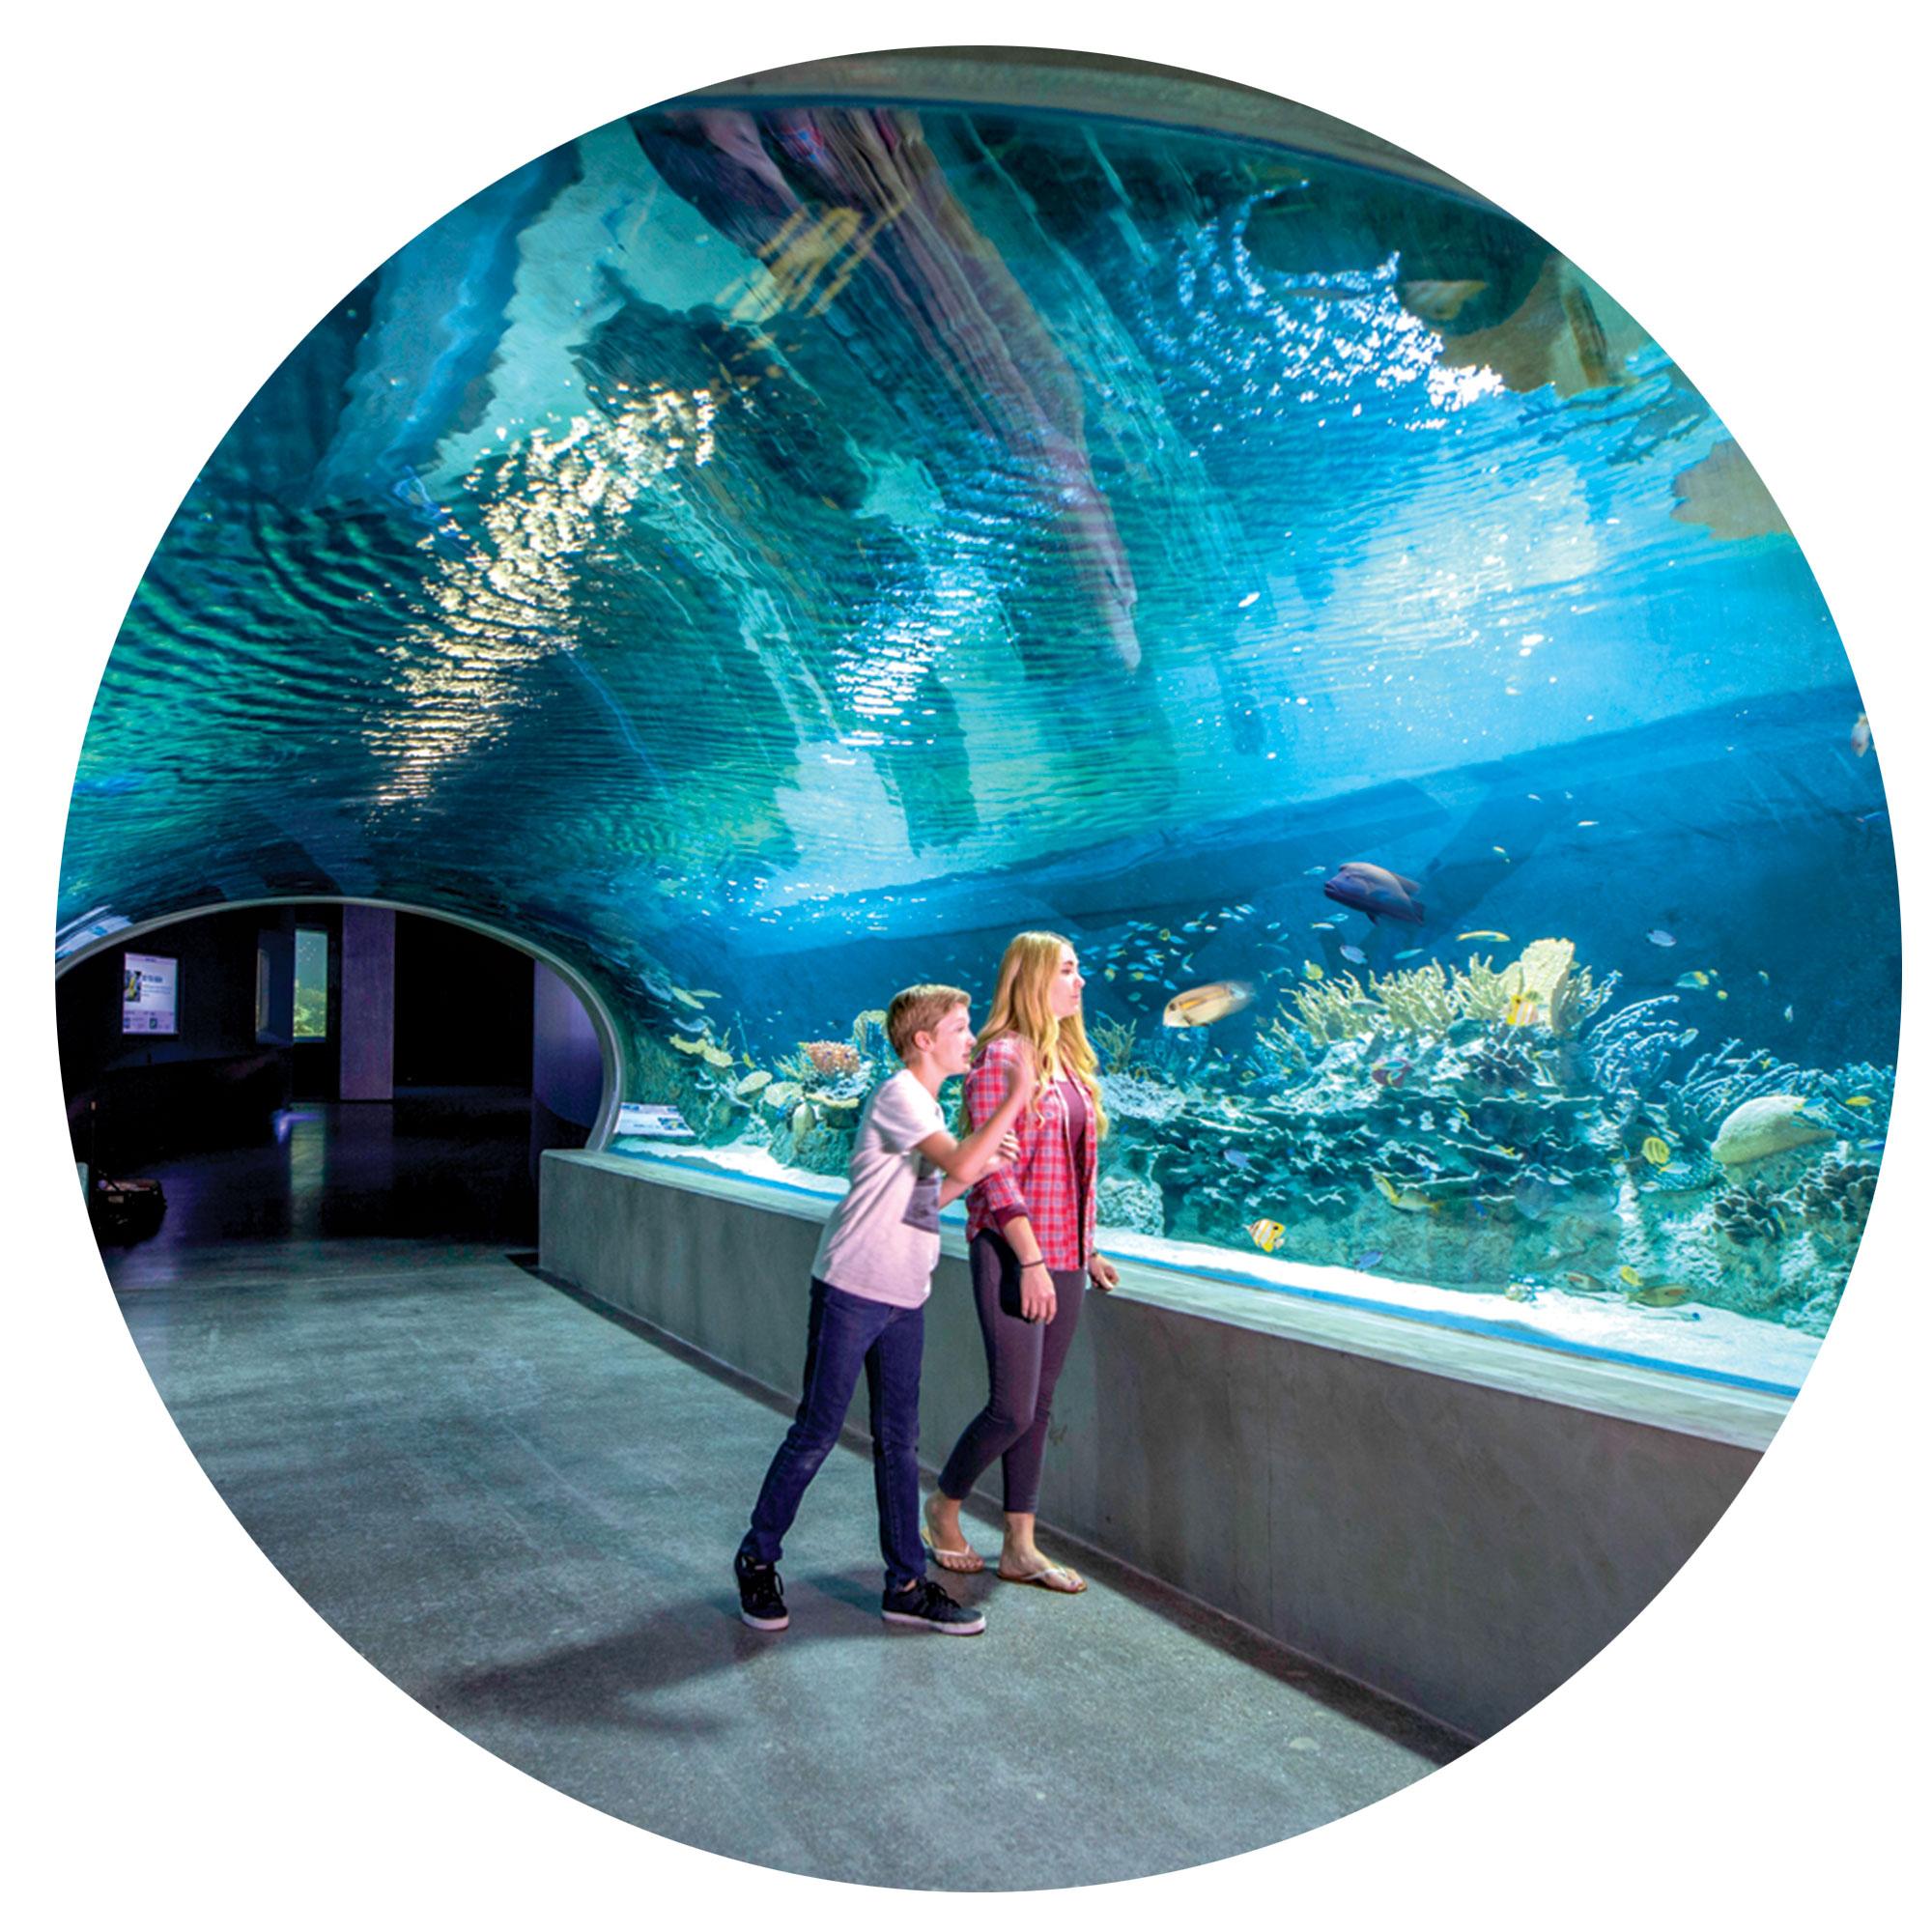 Photo courtesy Odysea Aquarium